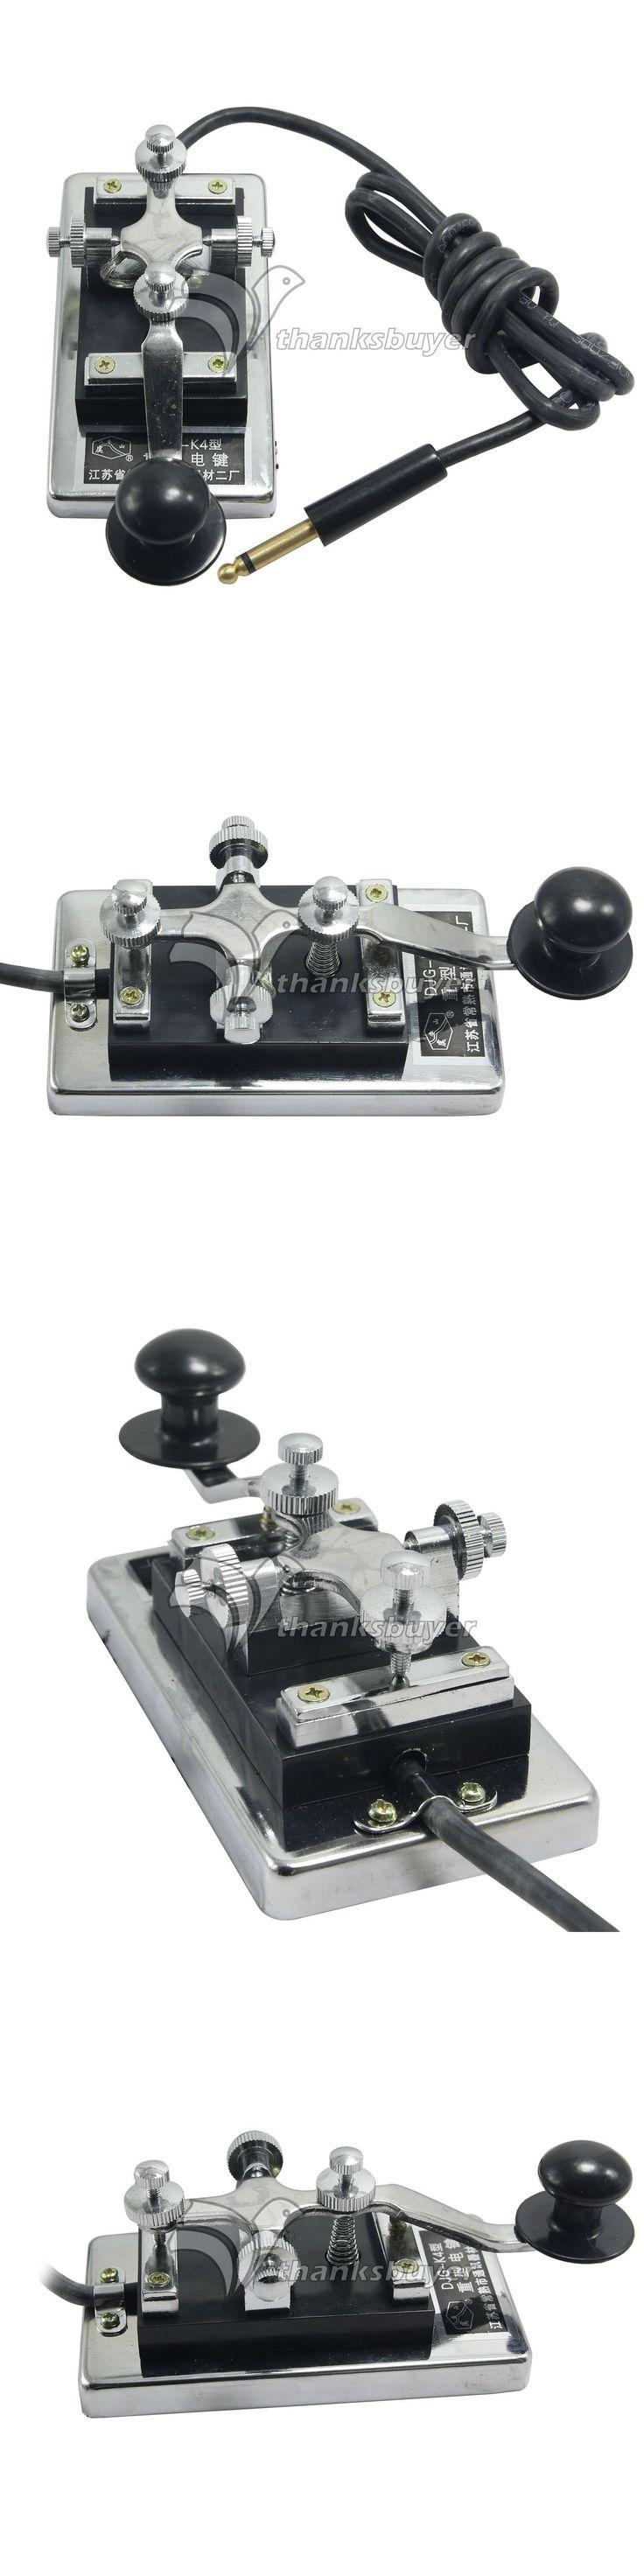 Code Keyers and Keys: Morse Code Trainer Shortwave Radio Telegraph Key Cw Radio K4 Key Chamber Props -> BUY IT NOW ONLY: $53.5 on eBay!